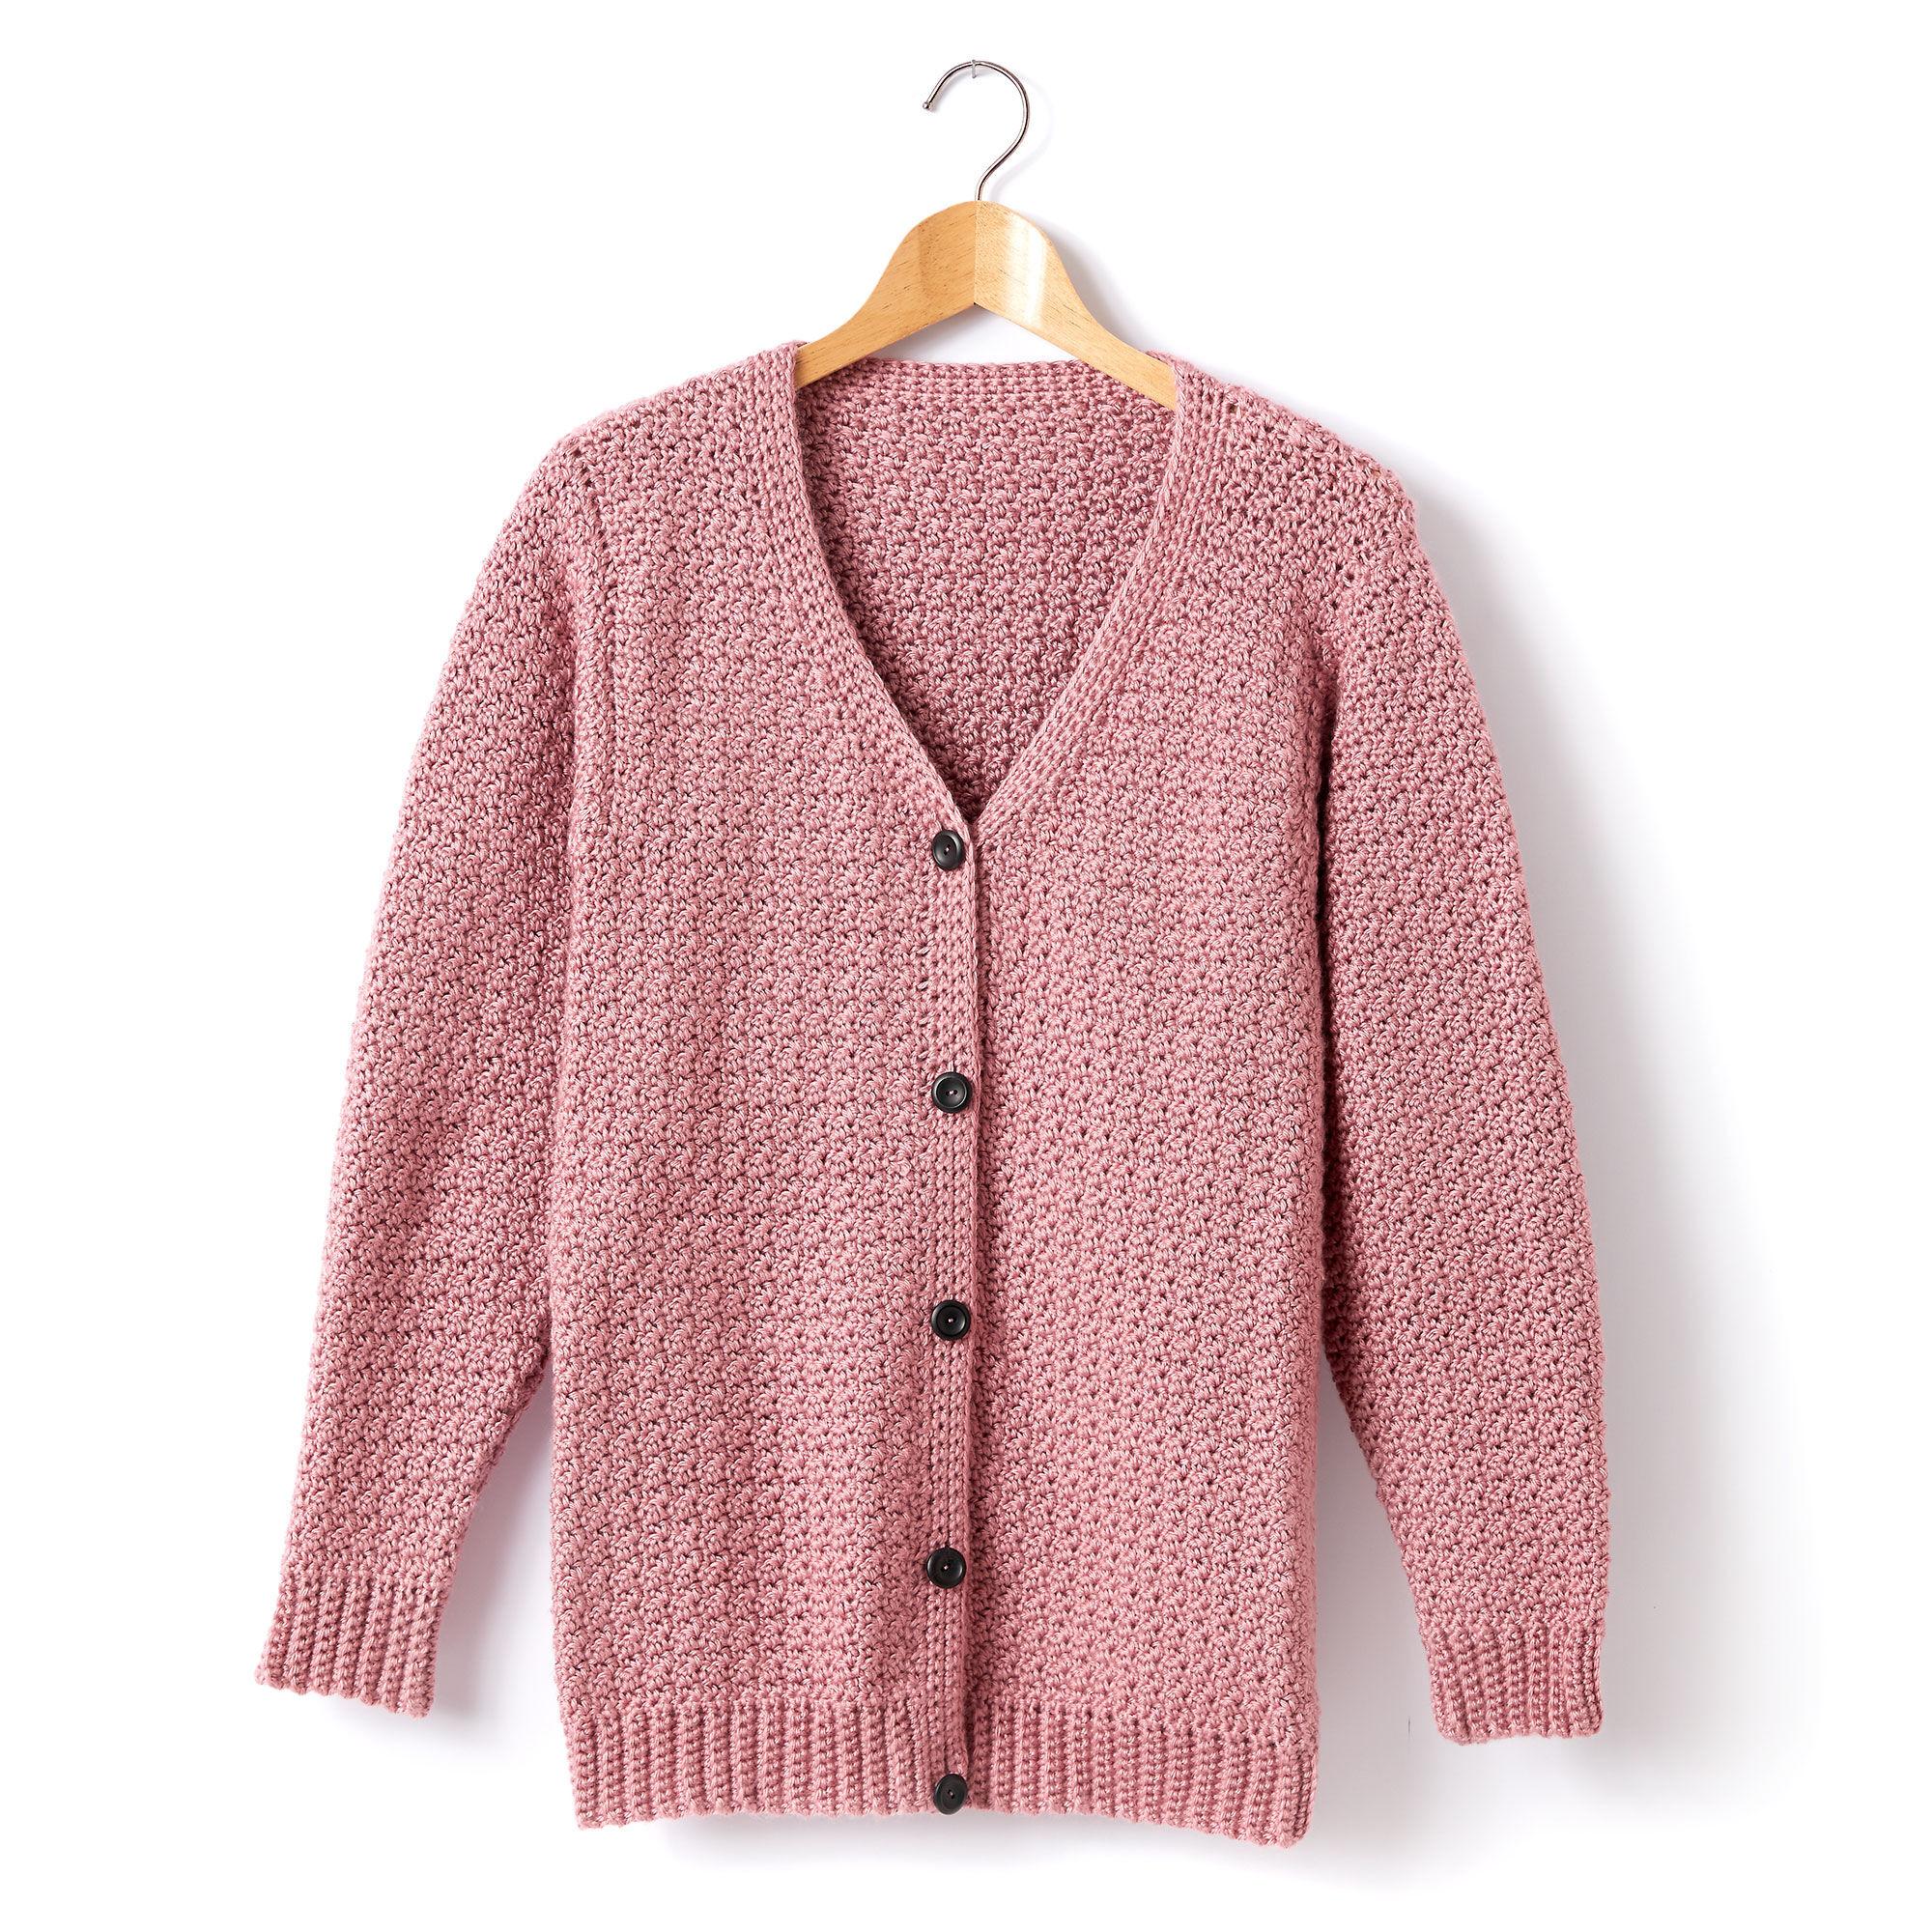 Caron Adult Crochet V Neck Cardigan Plum Wine Xss Yarnspirations